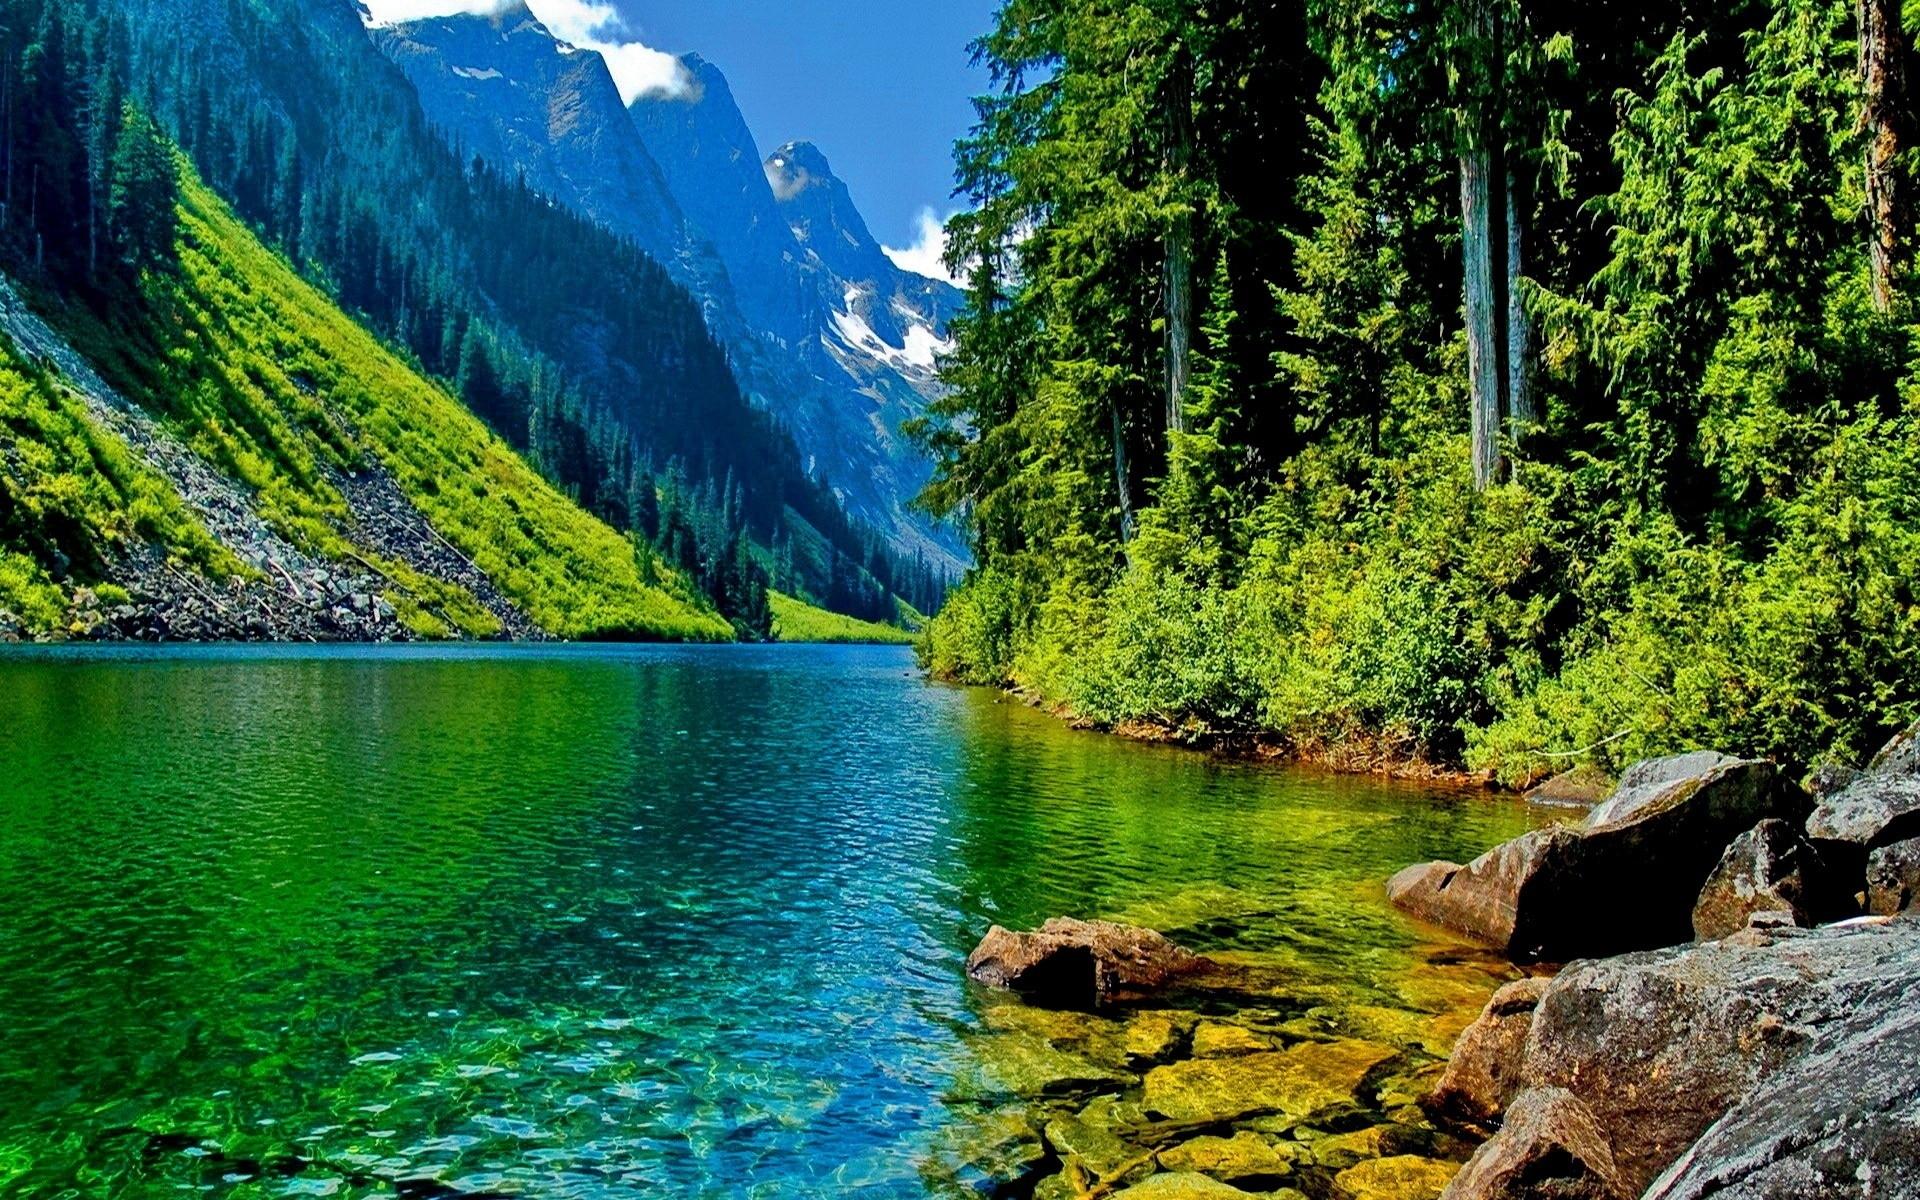 green mountain landscape wallpaper | hd desktop background